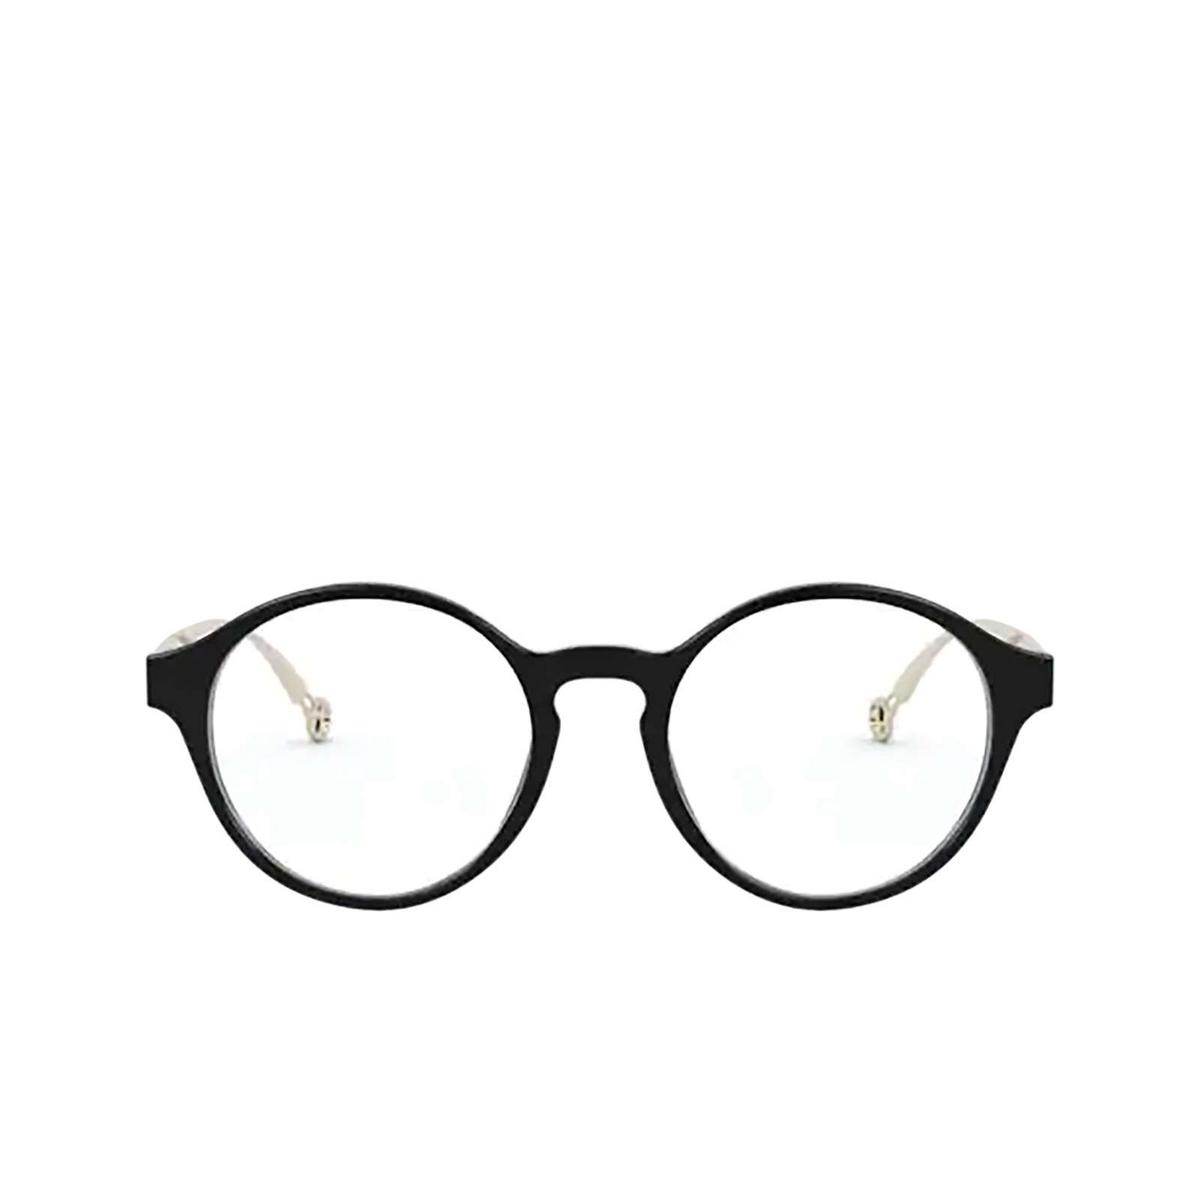 Giorgio Armani® Round Eyeglasses: AR7184 color Black 5001 - front view.